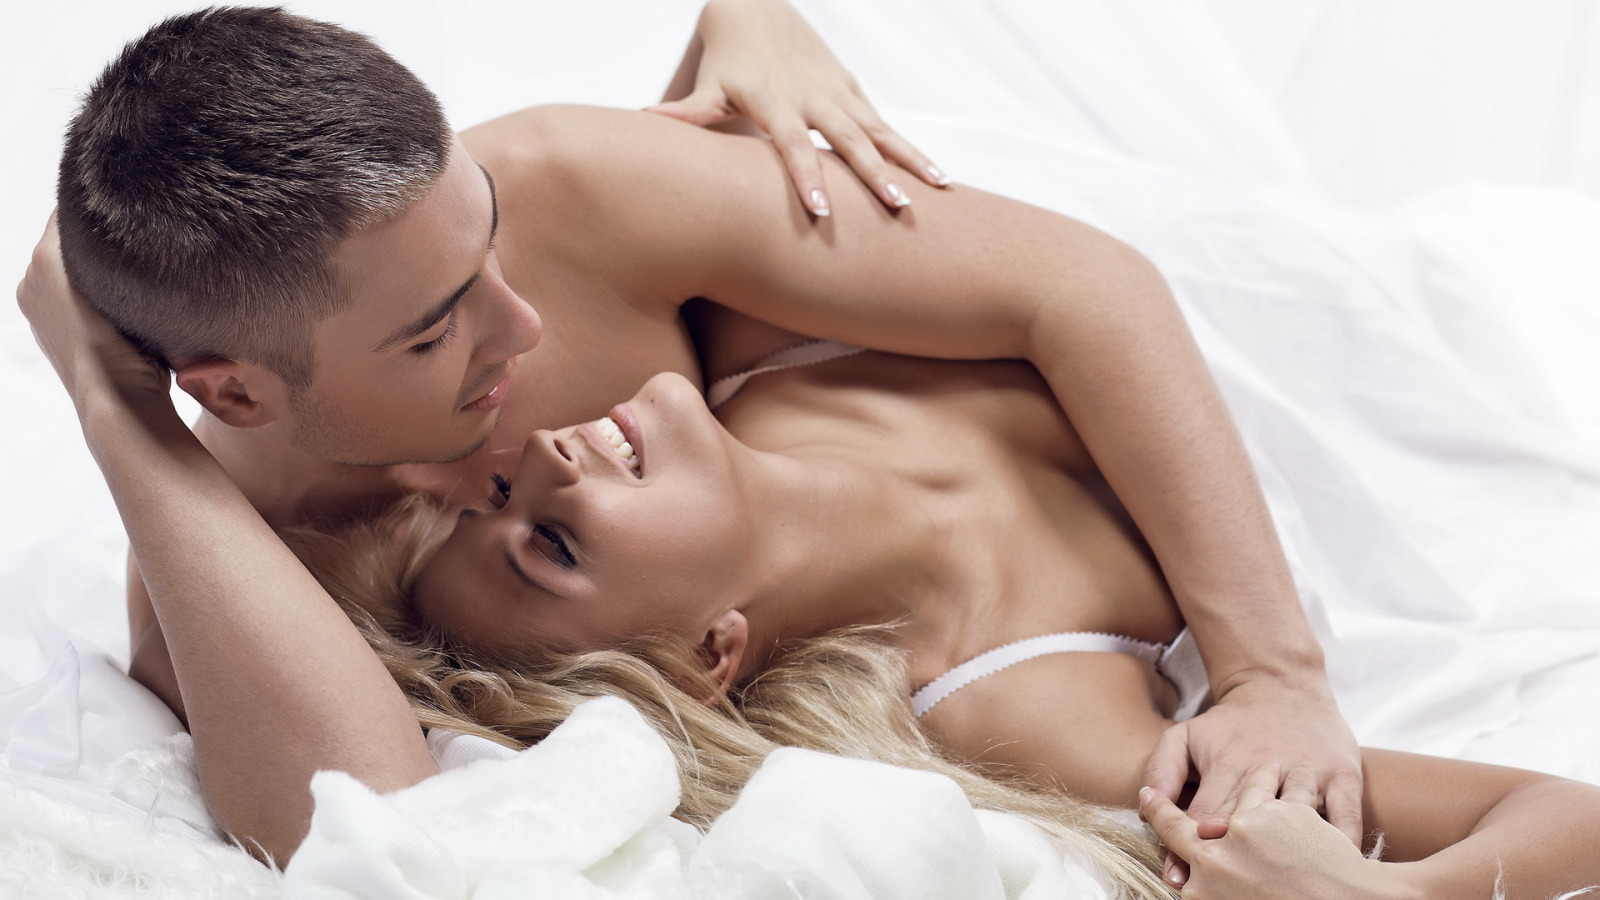 Sexygirl make love